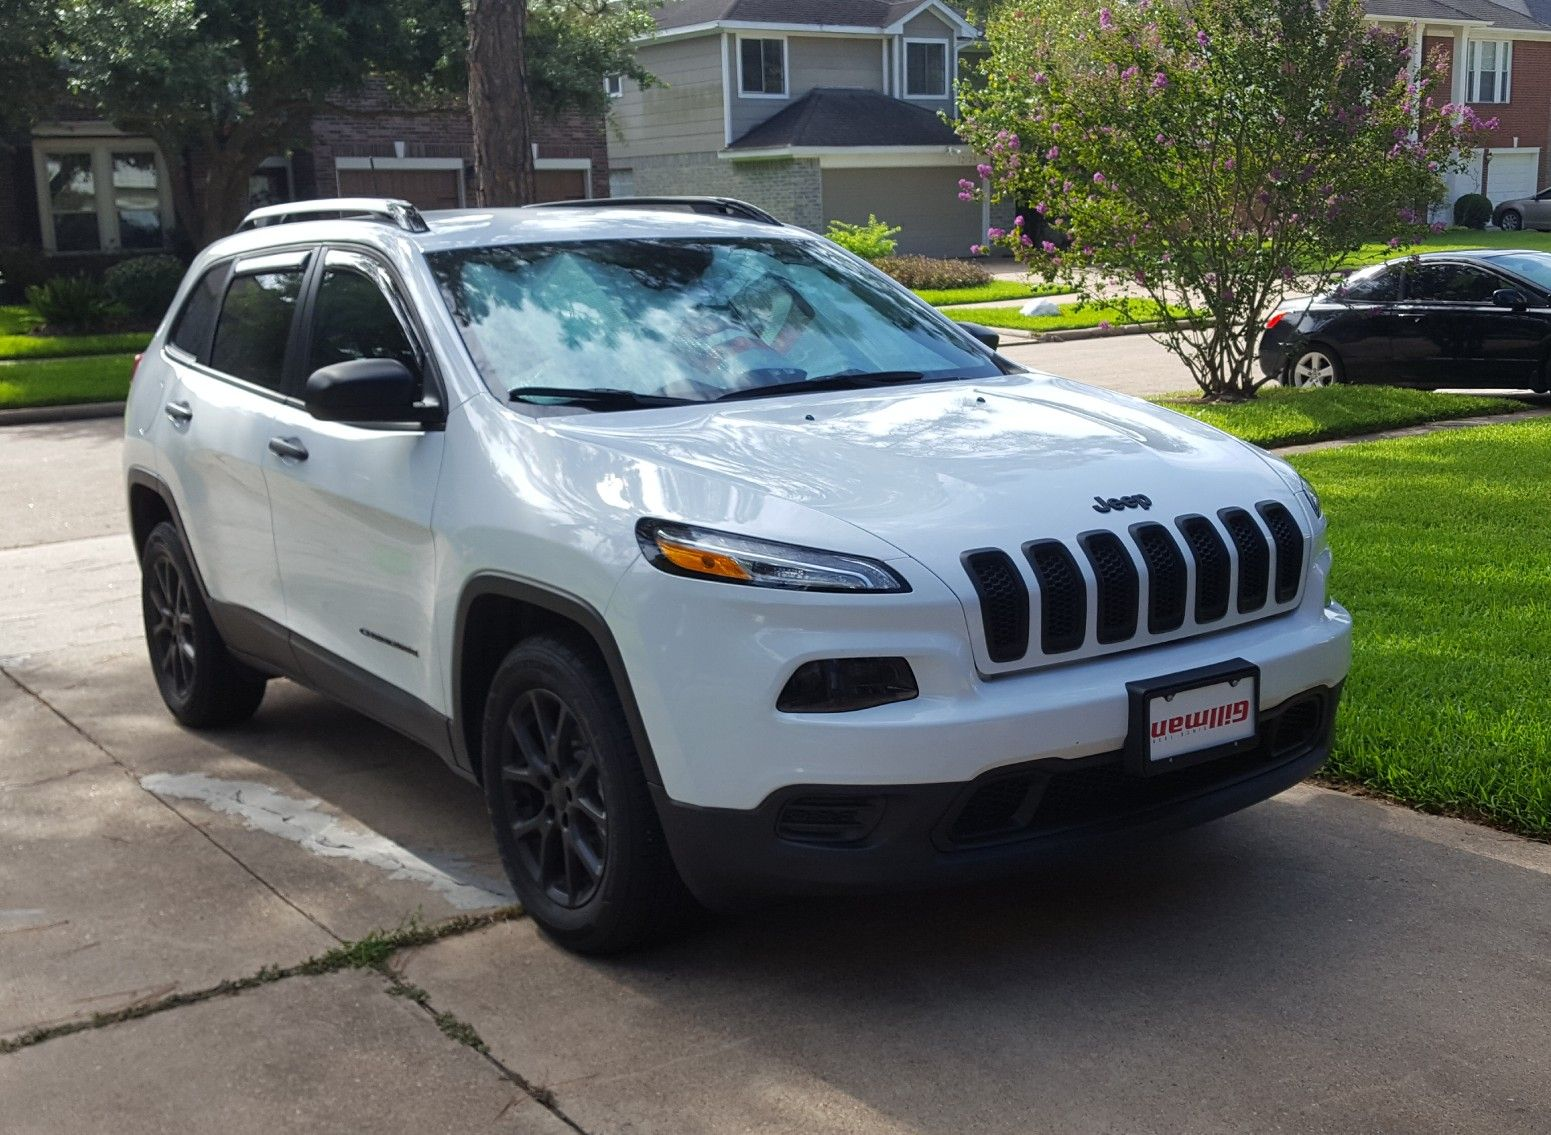 2017 Cherokee Sport Plasti Dip Wheels Grille And Emblems Jeep Cherokee Limited Jeep Cherokee Cherokee Sport